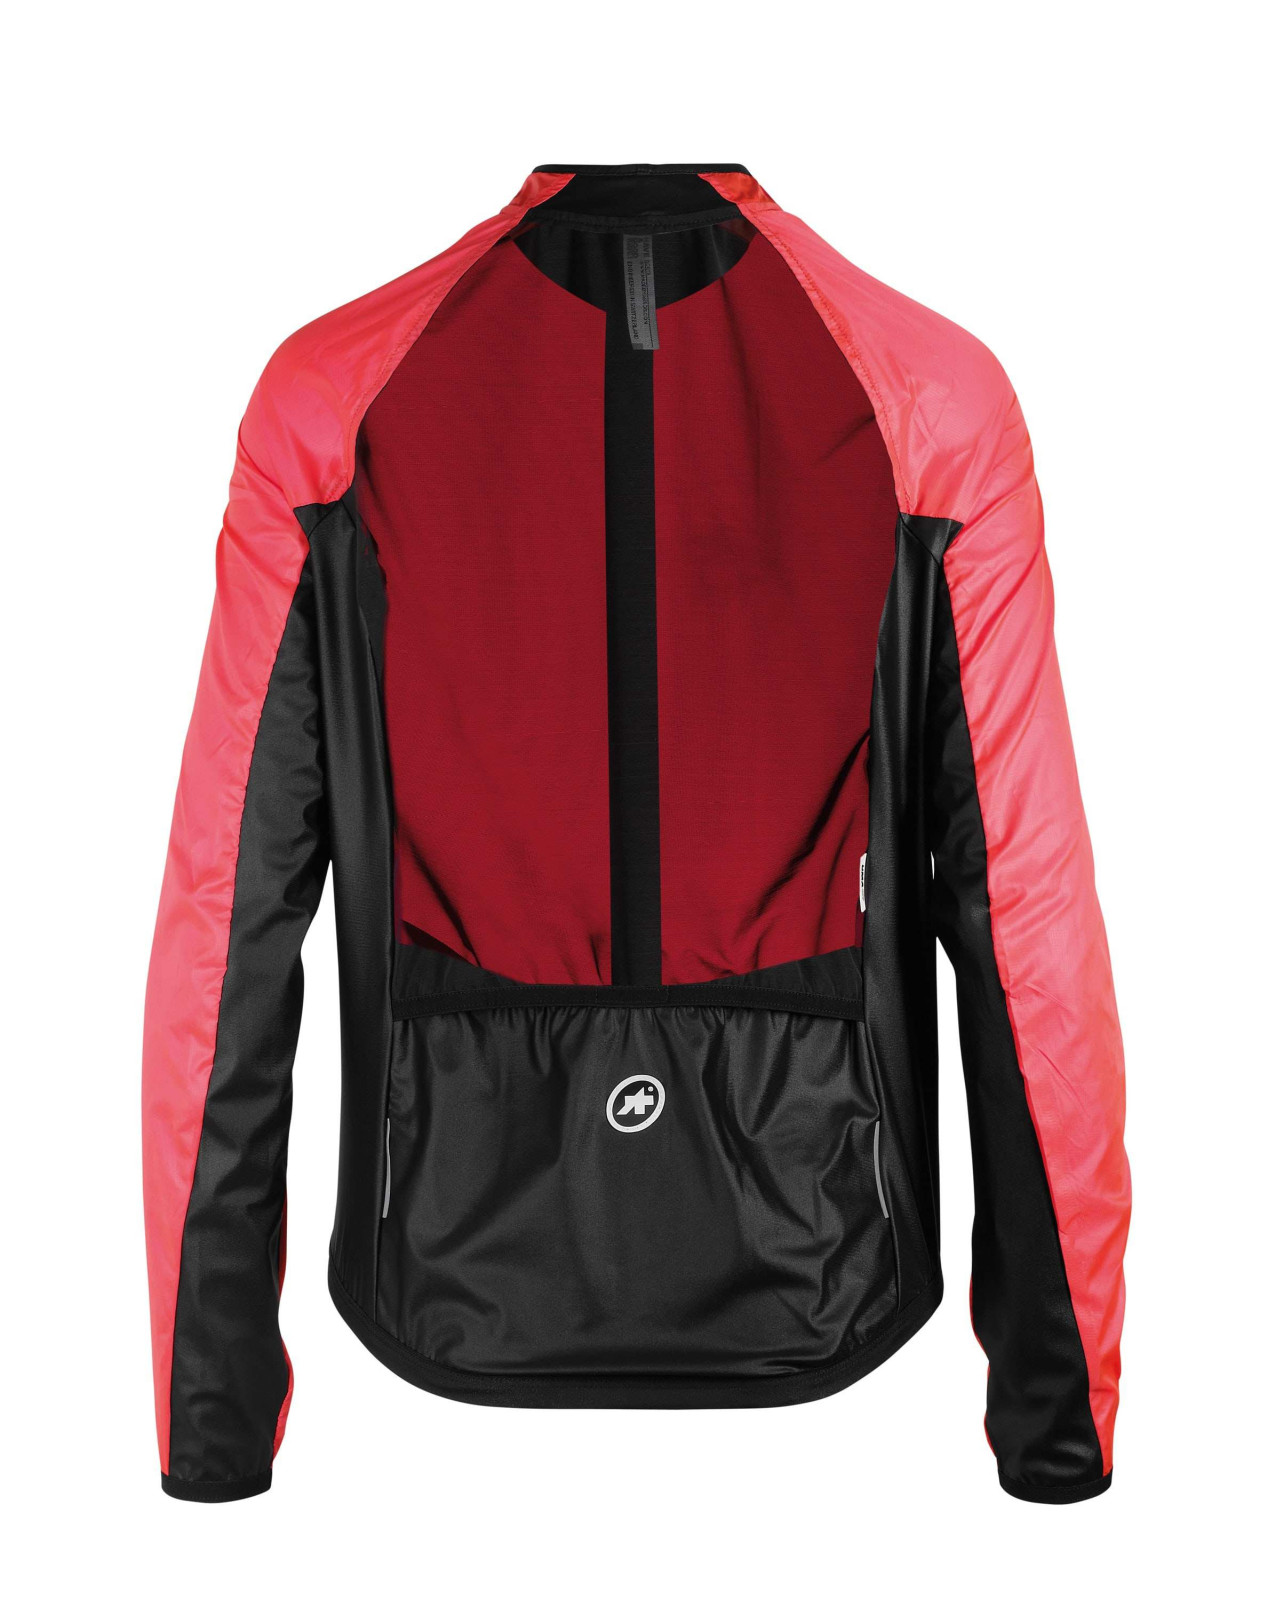 Assos UMA GT Womens Summer Wind Jacket - Jackets - Cycle SuperStore e1daeba38